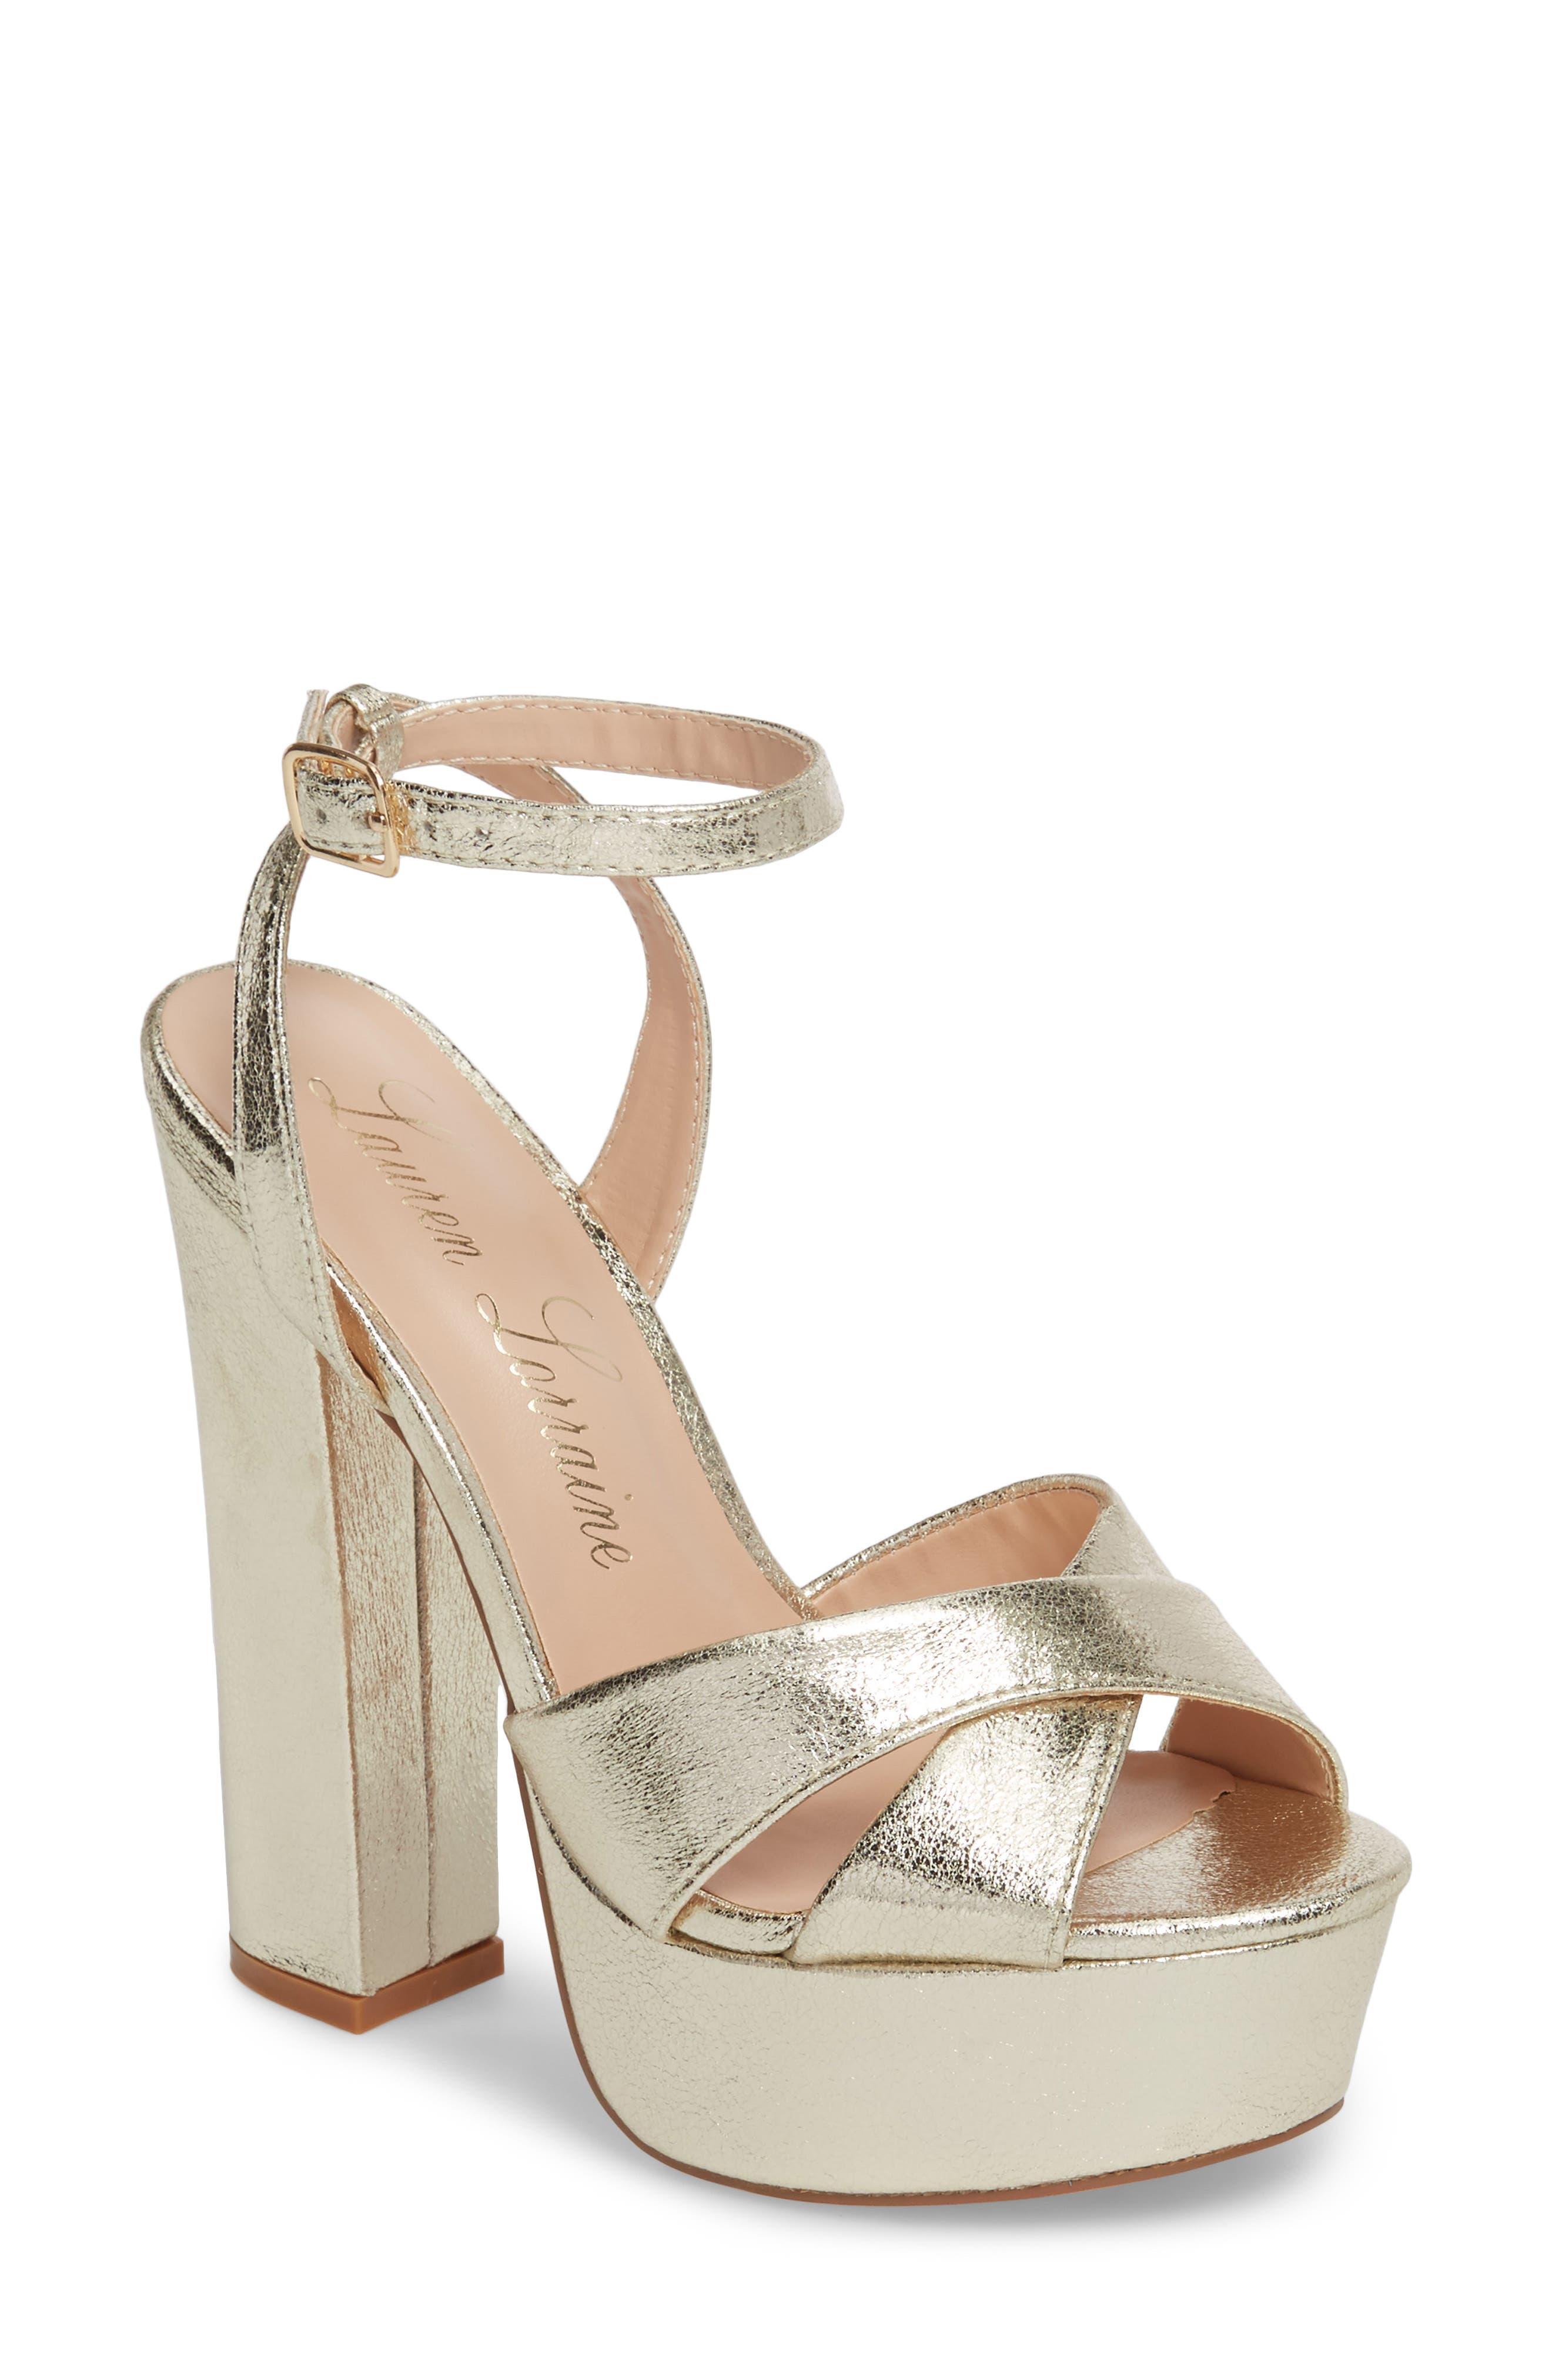 Lauren Lorraine Carla Platform Sandal, Metallic